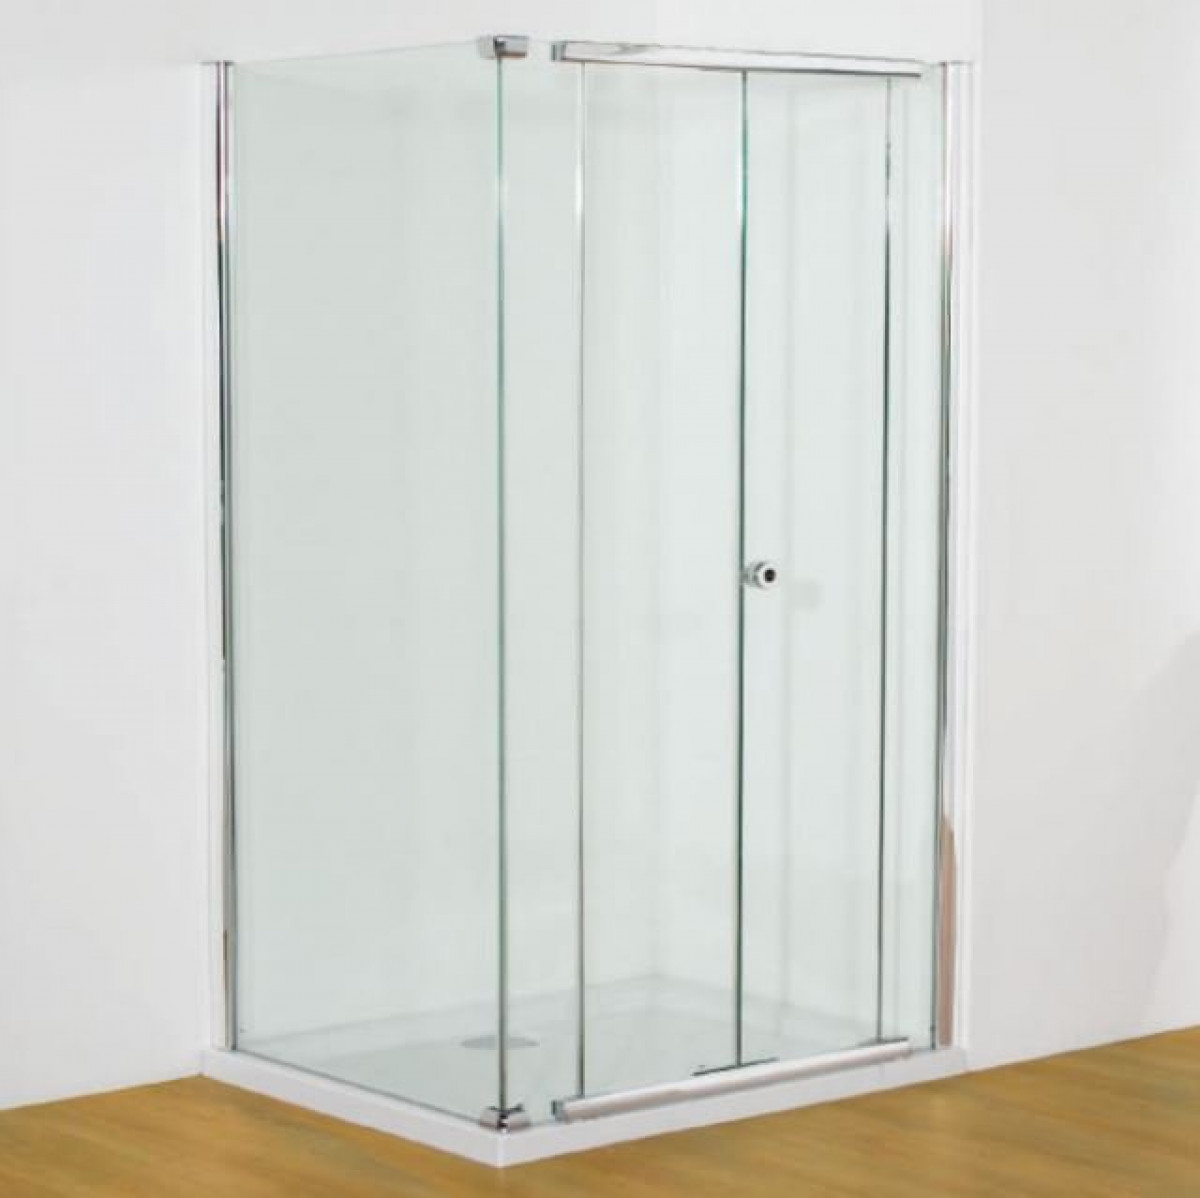 Kudos Infinite 800mm Centre Folding Door Enclosure | 4BF80S -